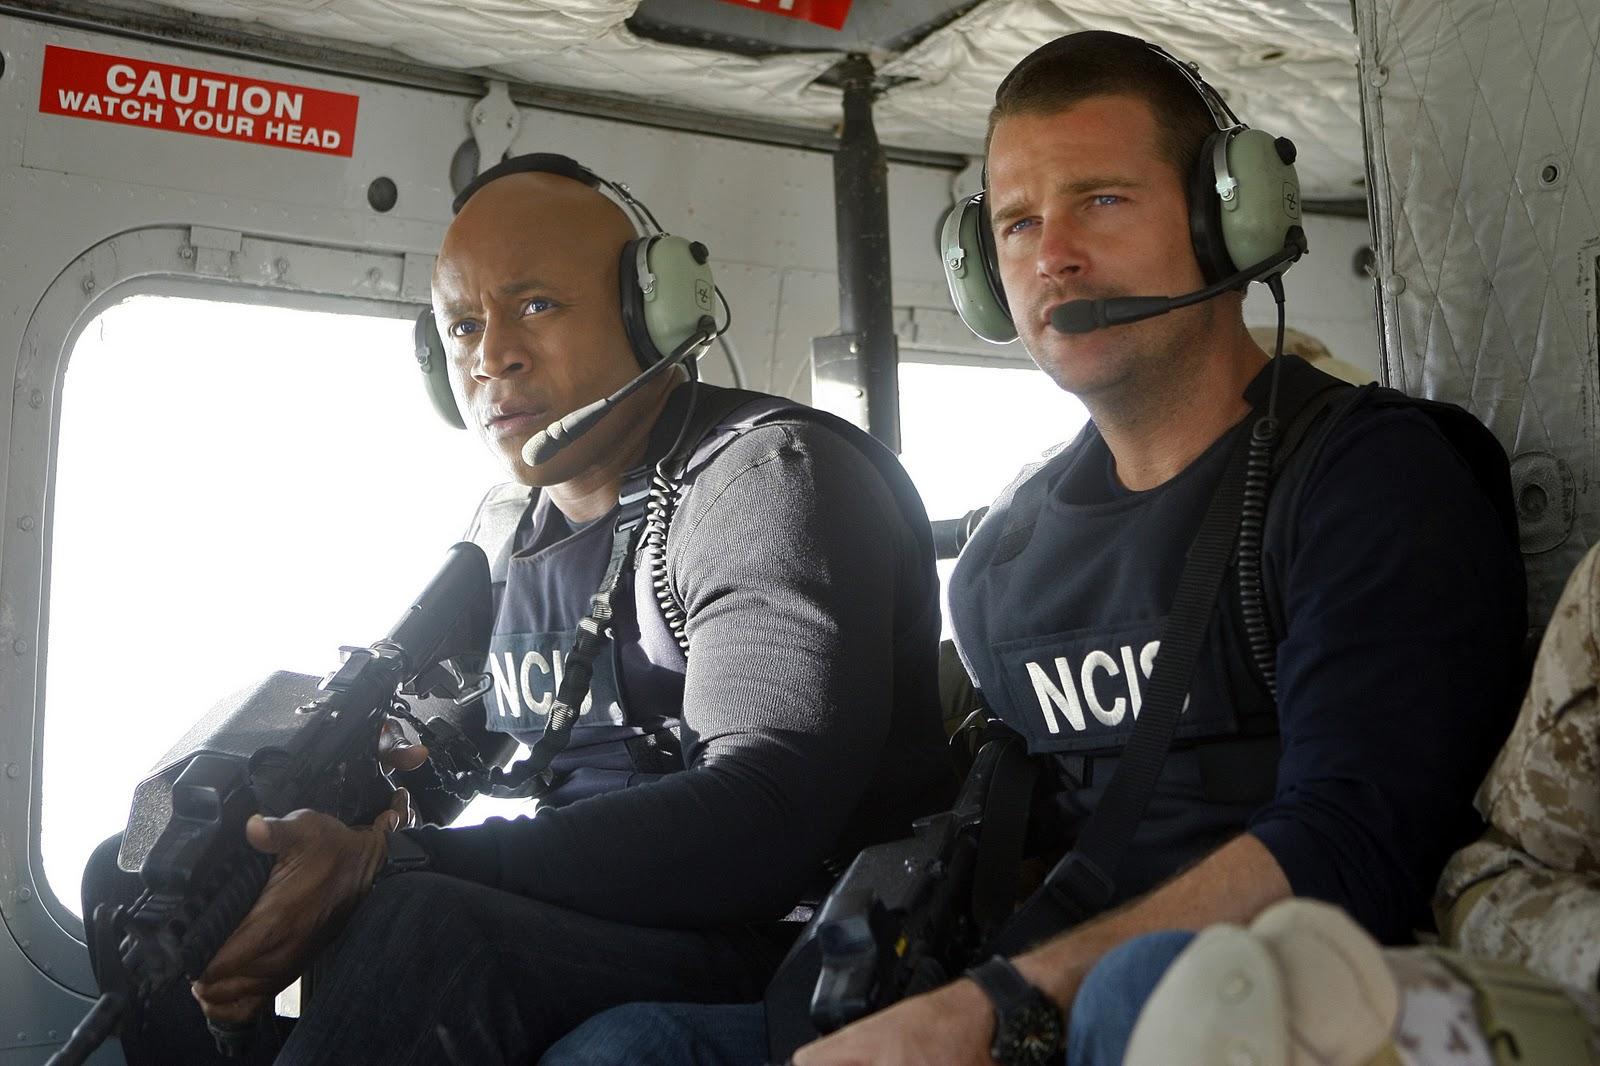 Ncis La: NCIS Los Angeles FAN: April 2011